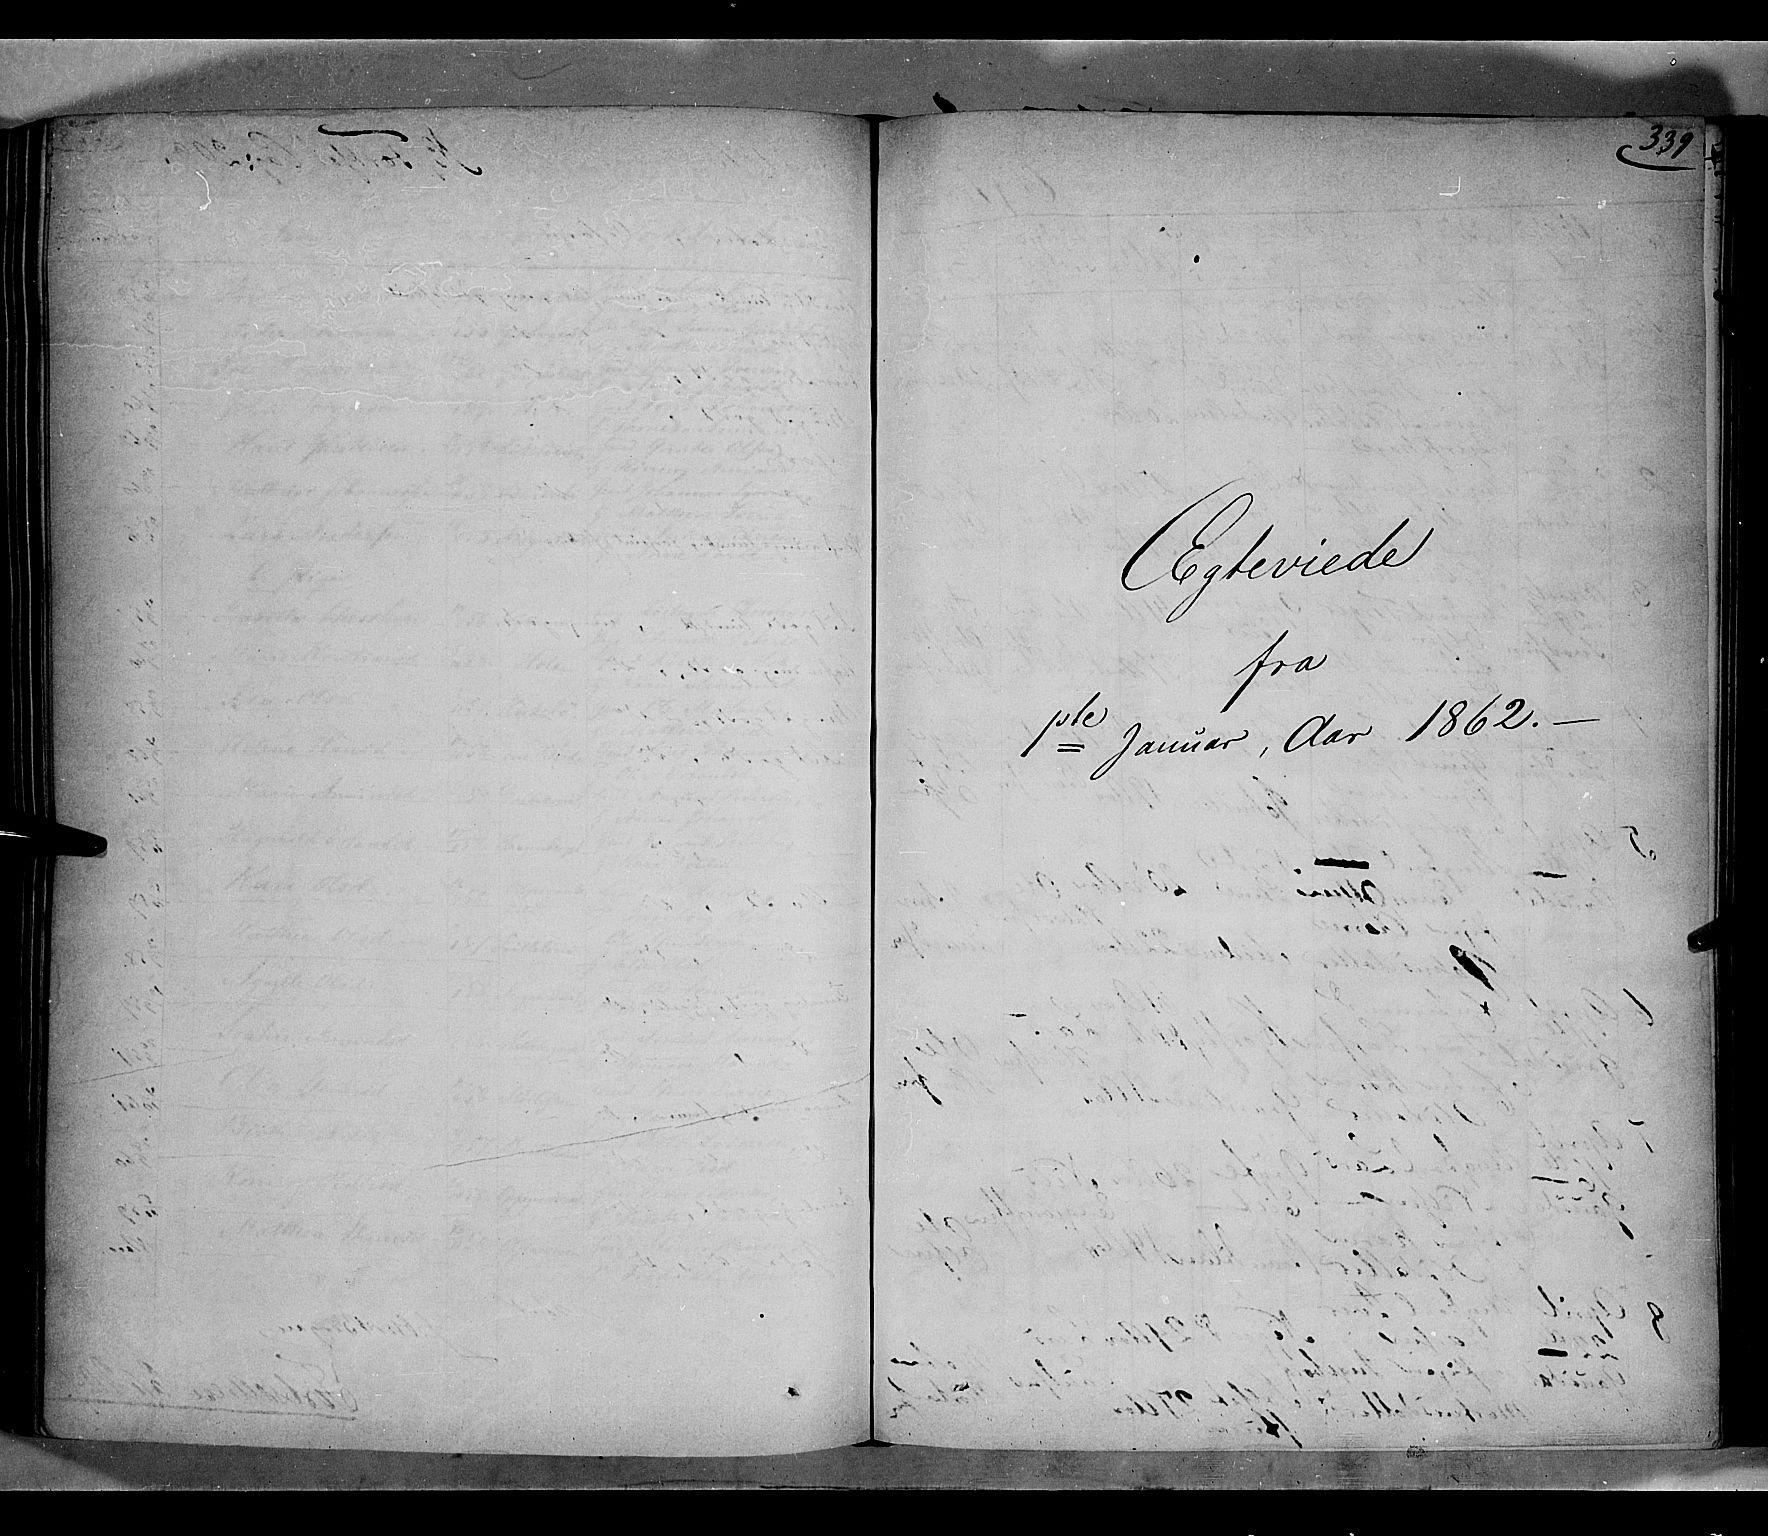 SAH, Gausdal prestekontor, Ministerialbok nr. 9, 1862-1873, s. 339